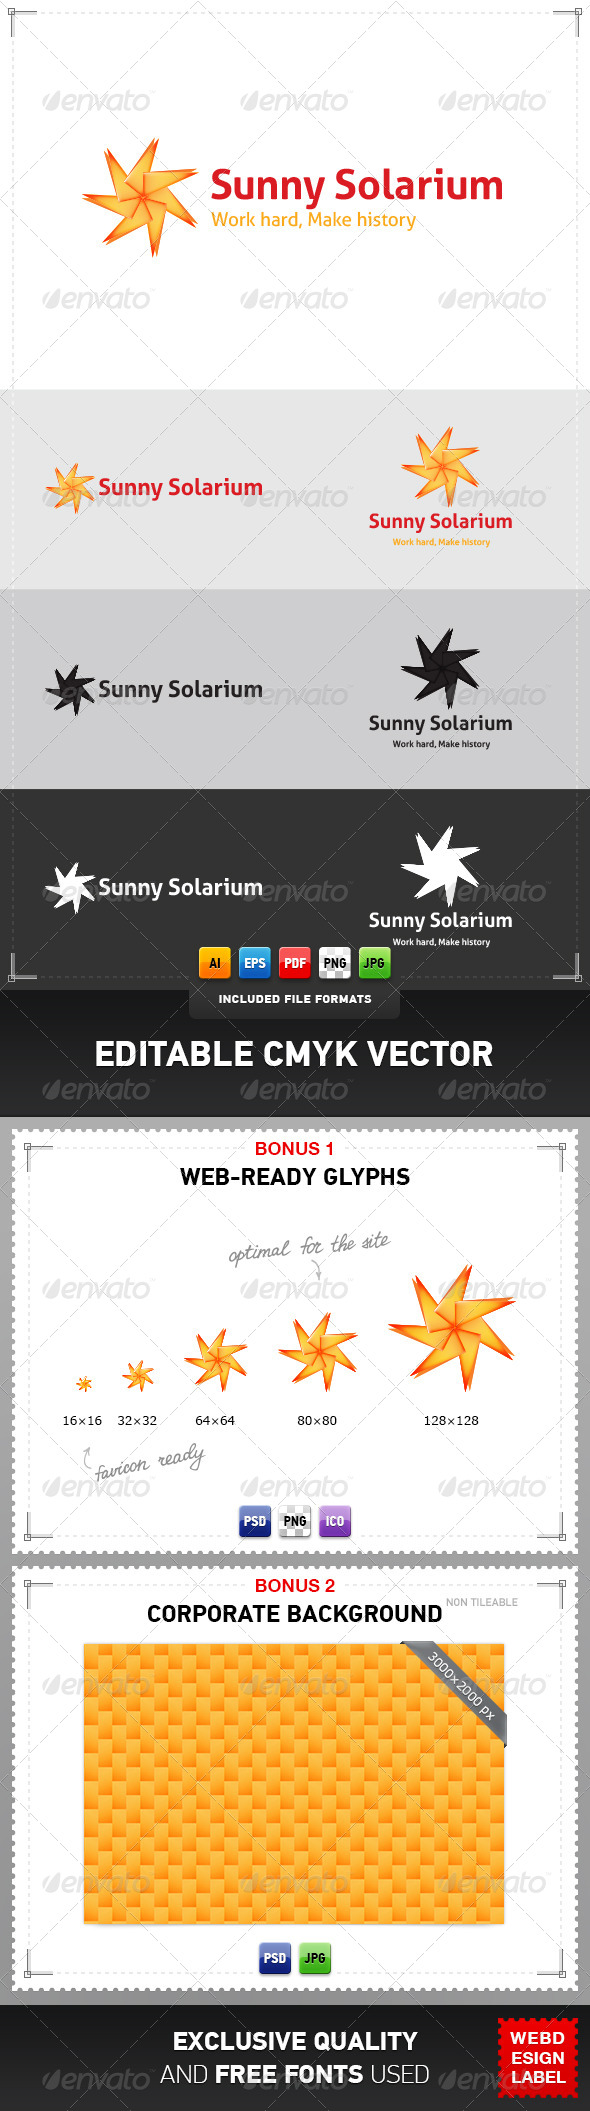 GraphicRiver Sunny Solarium Logo 4077414